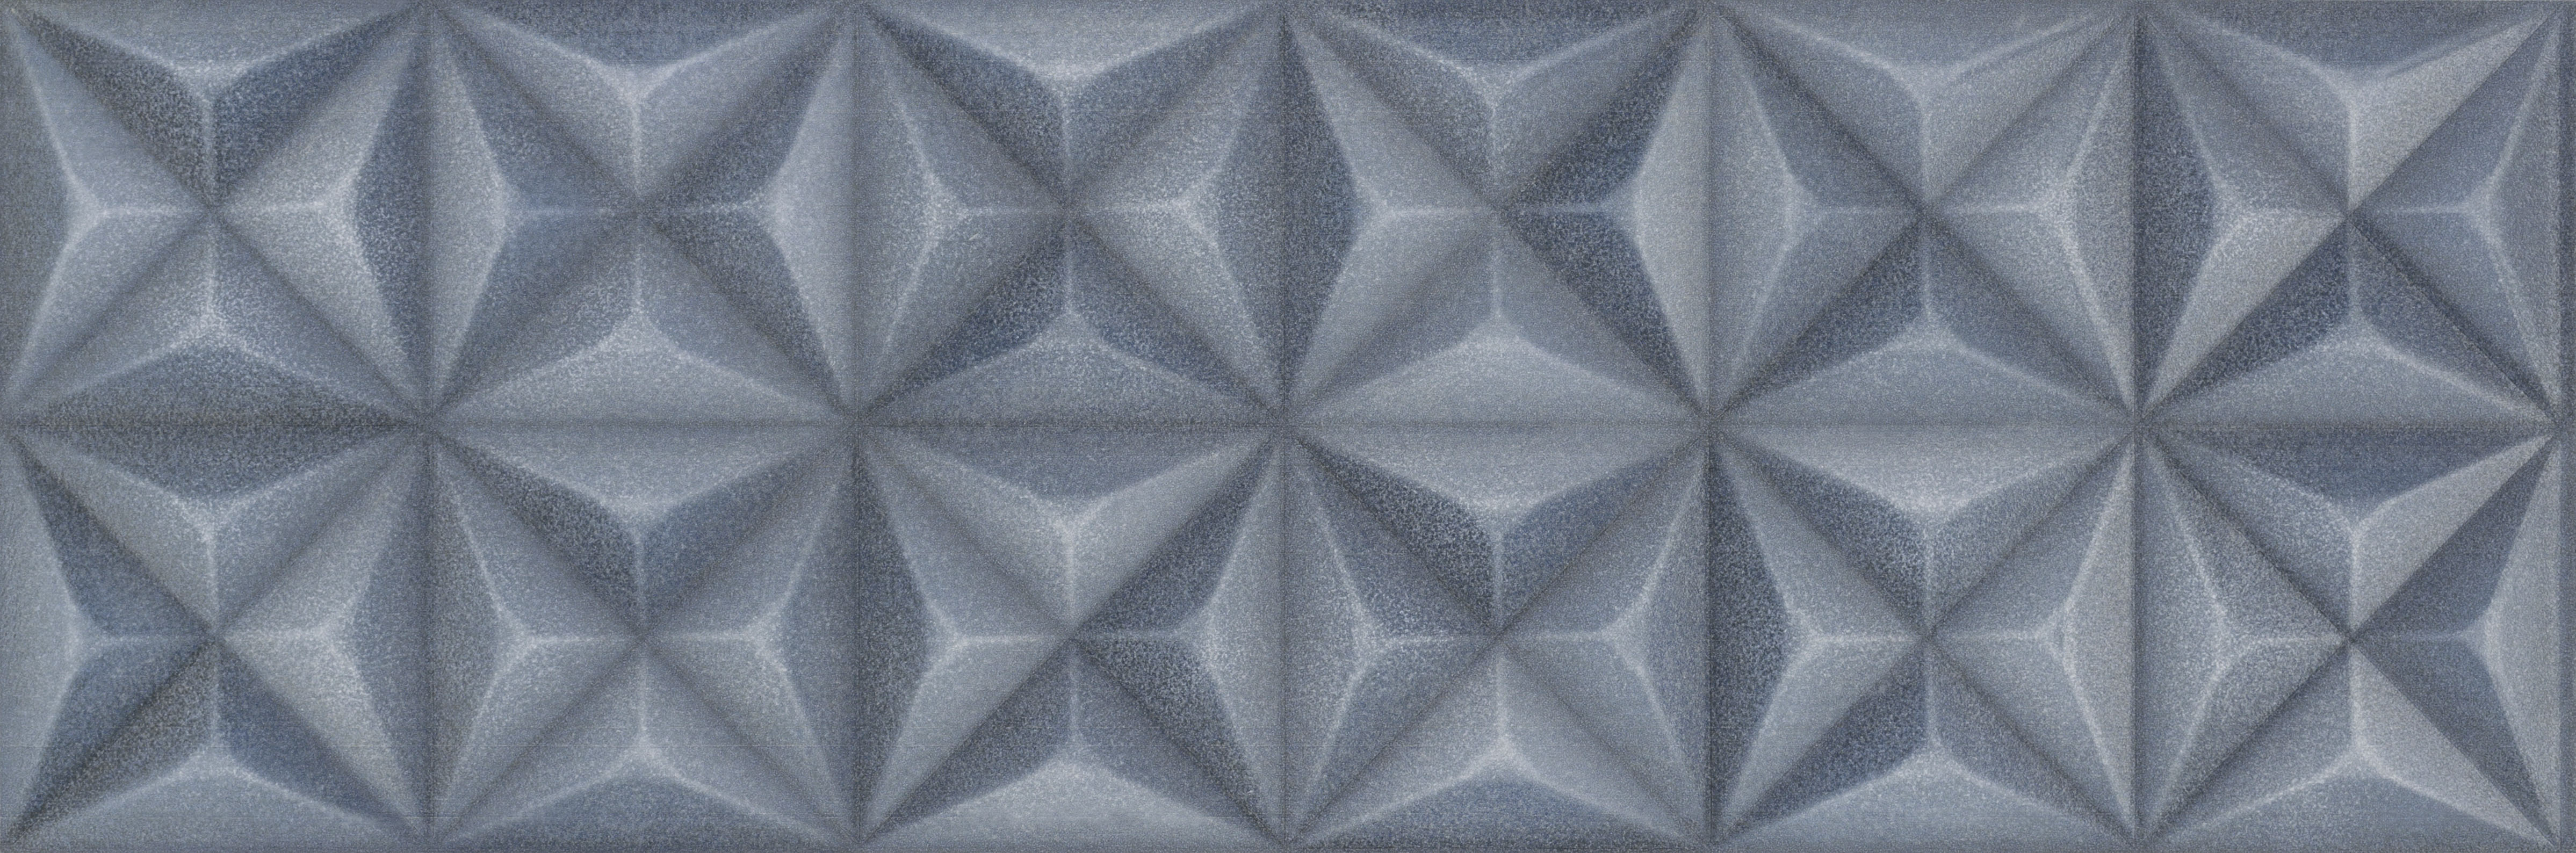 SENSORIAL DIAMOND BLMLX